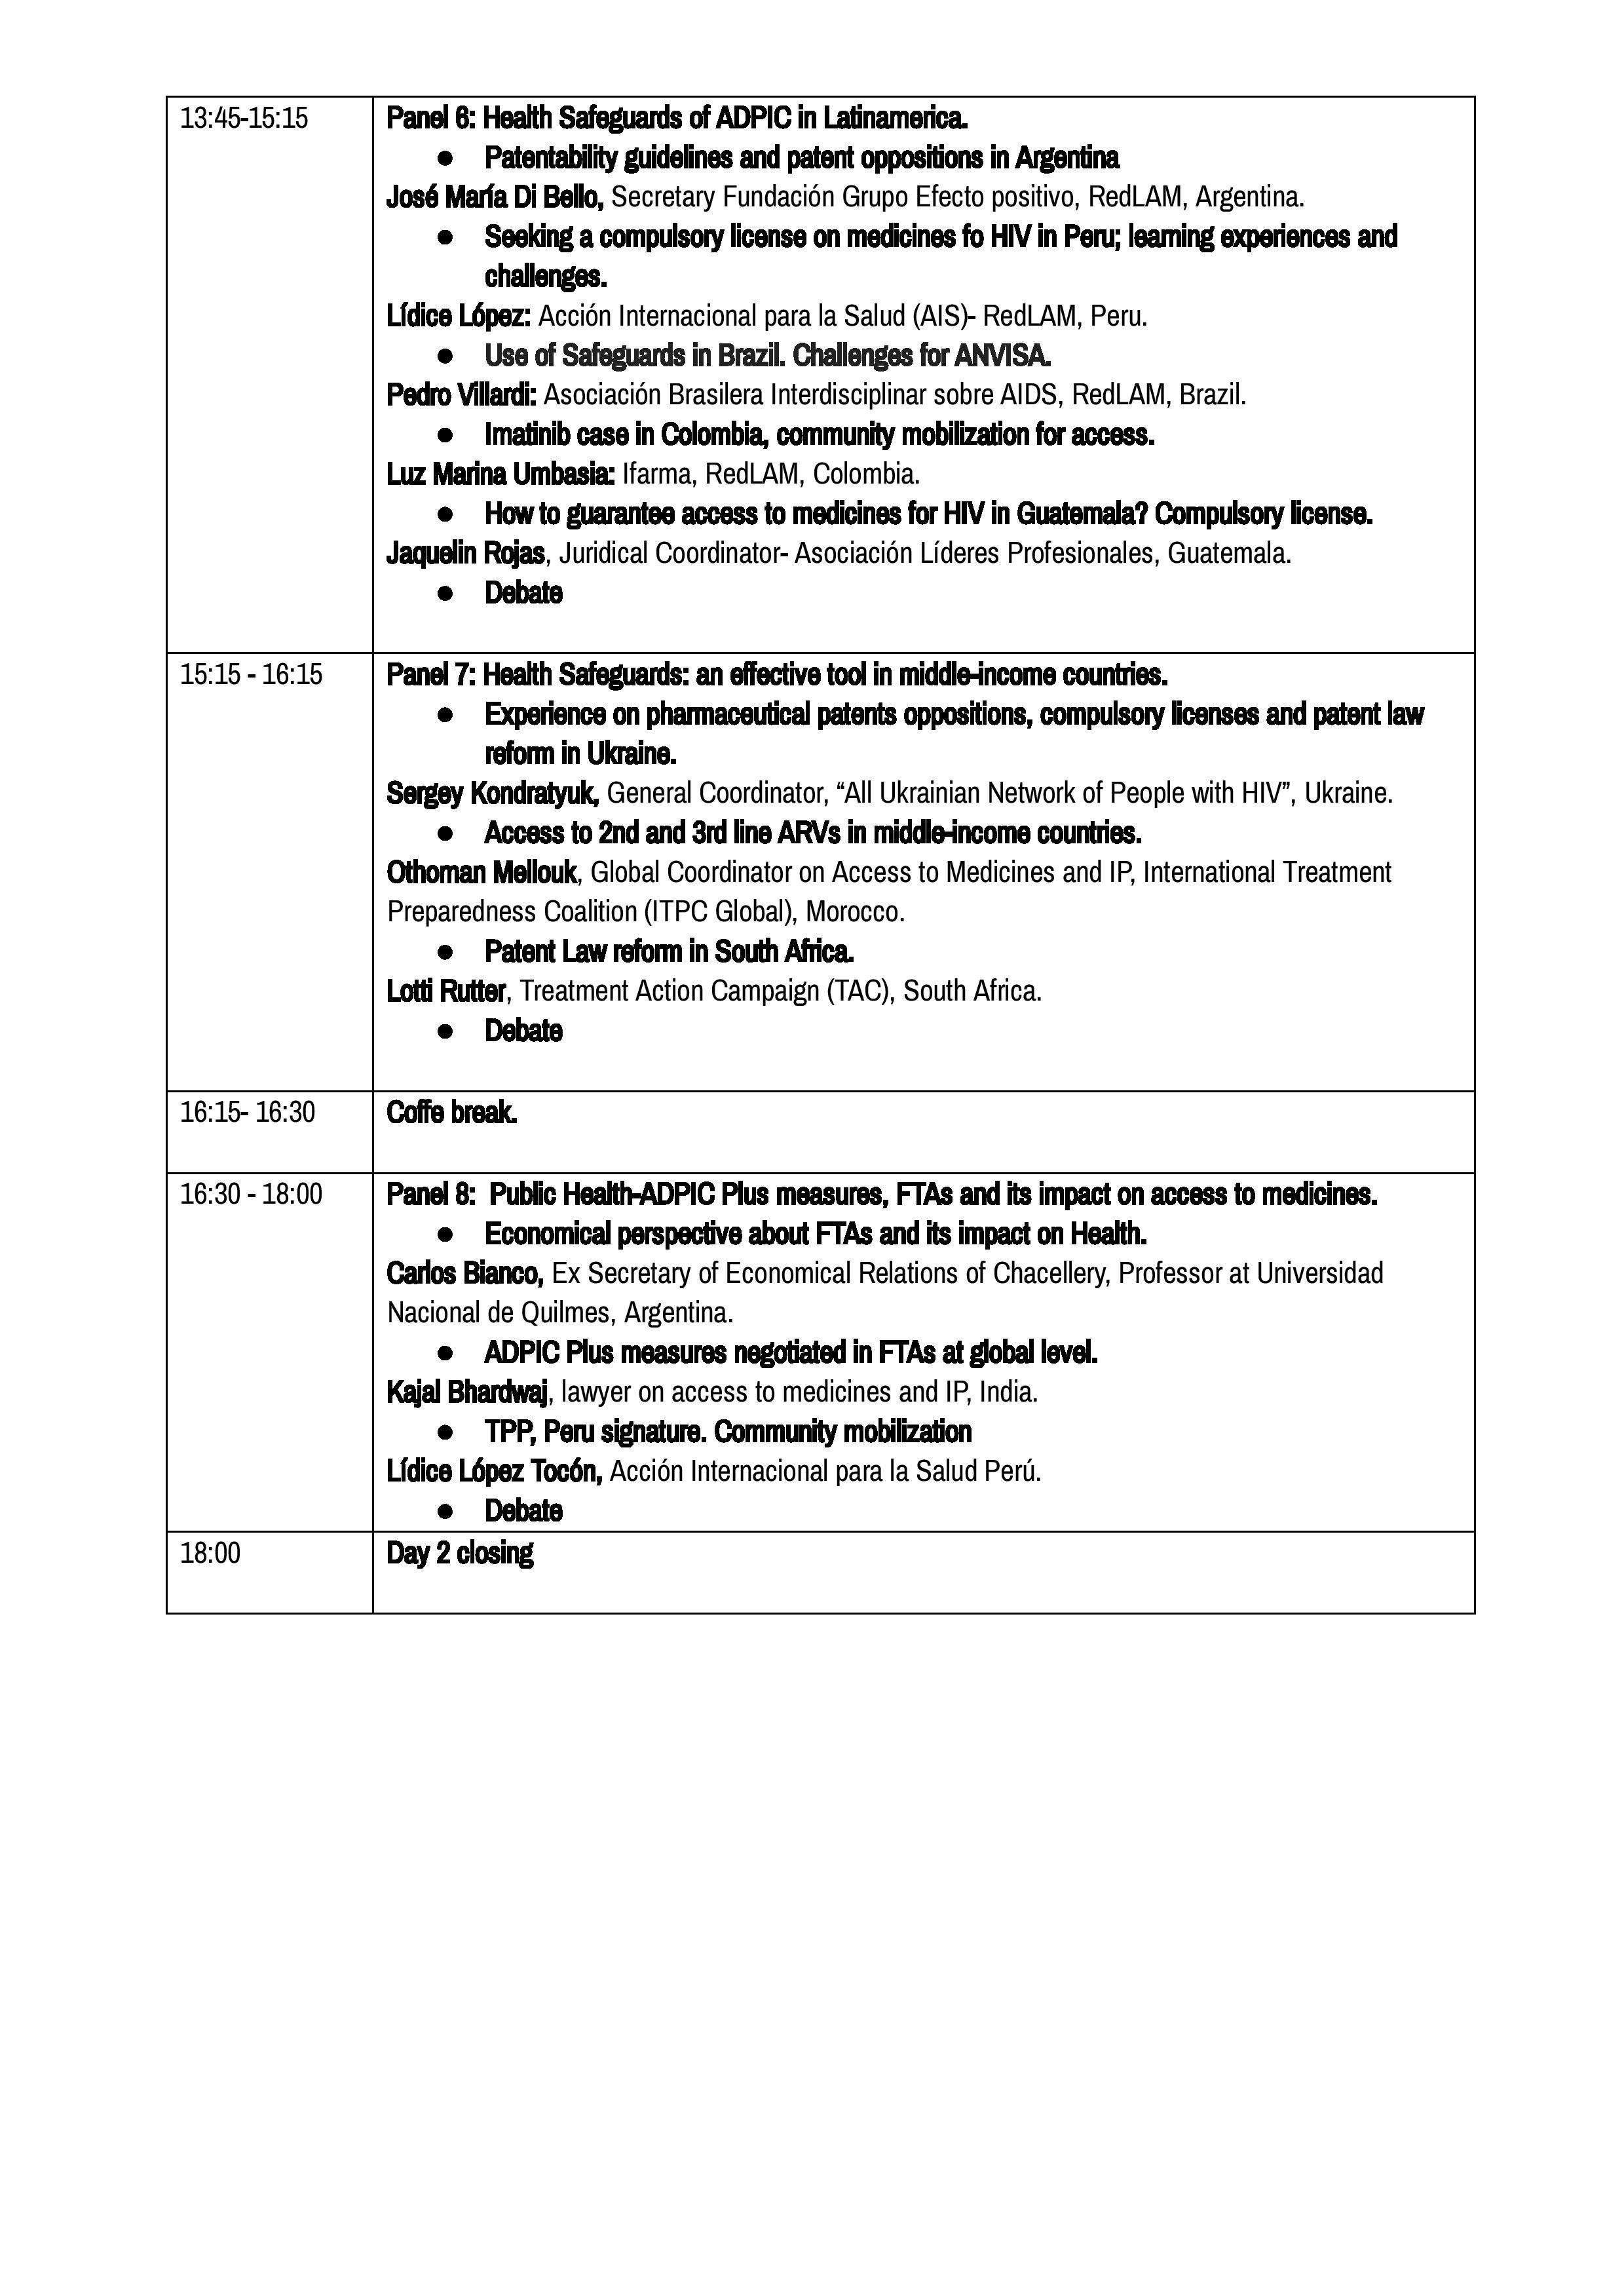 final-agenda-international-congress-print-docx_1479083532315-page-003